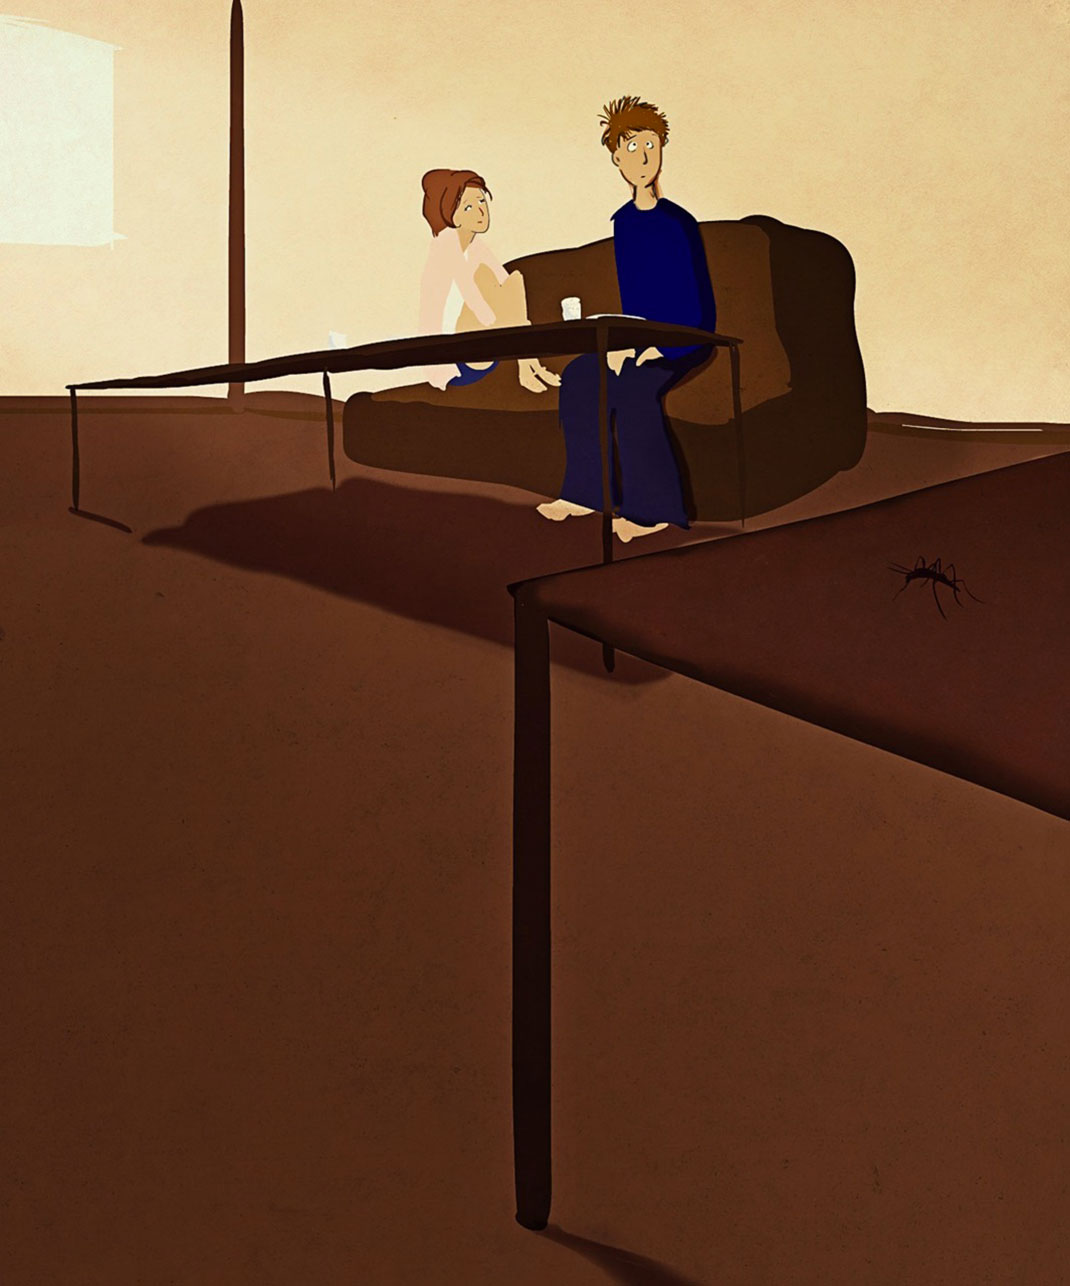 amour-365-jours-illustrations-couple38